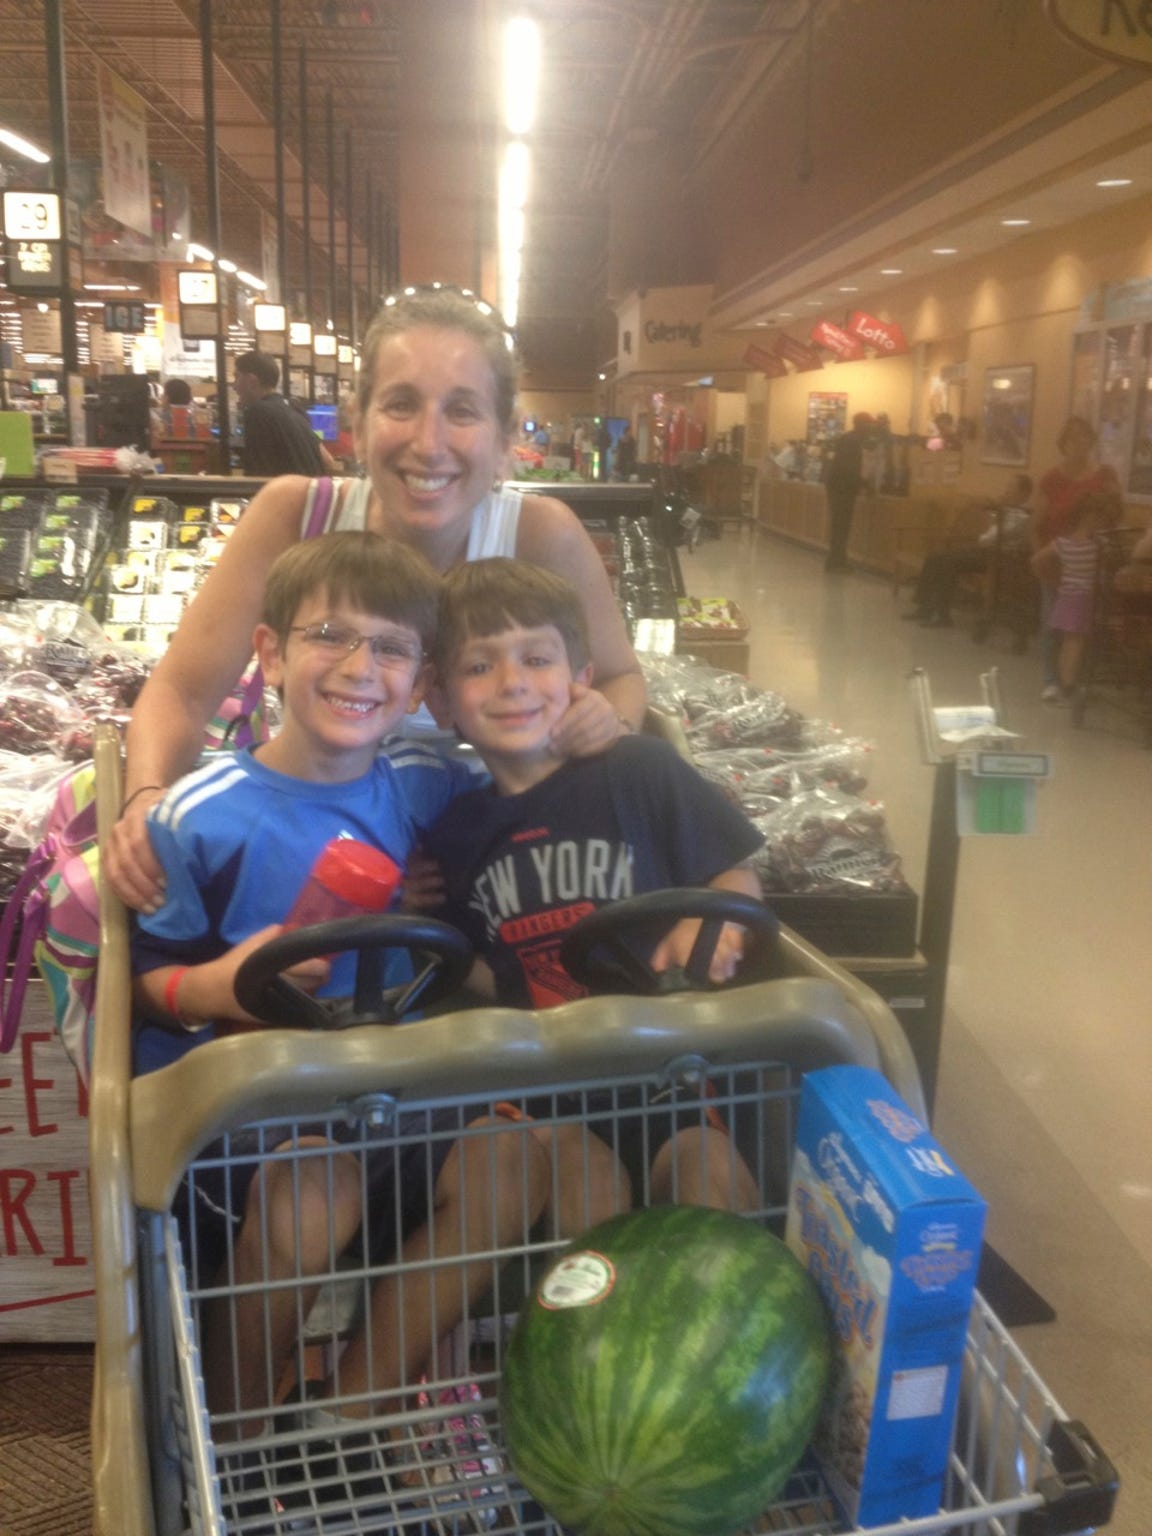 Grocery shopping was daunting, but she soon got the hang of Wegmans.